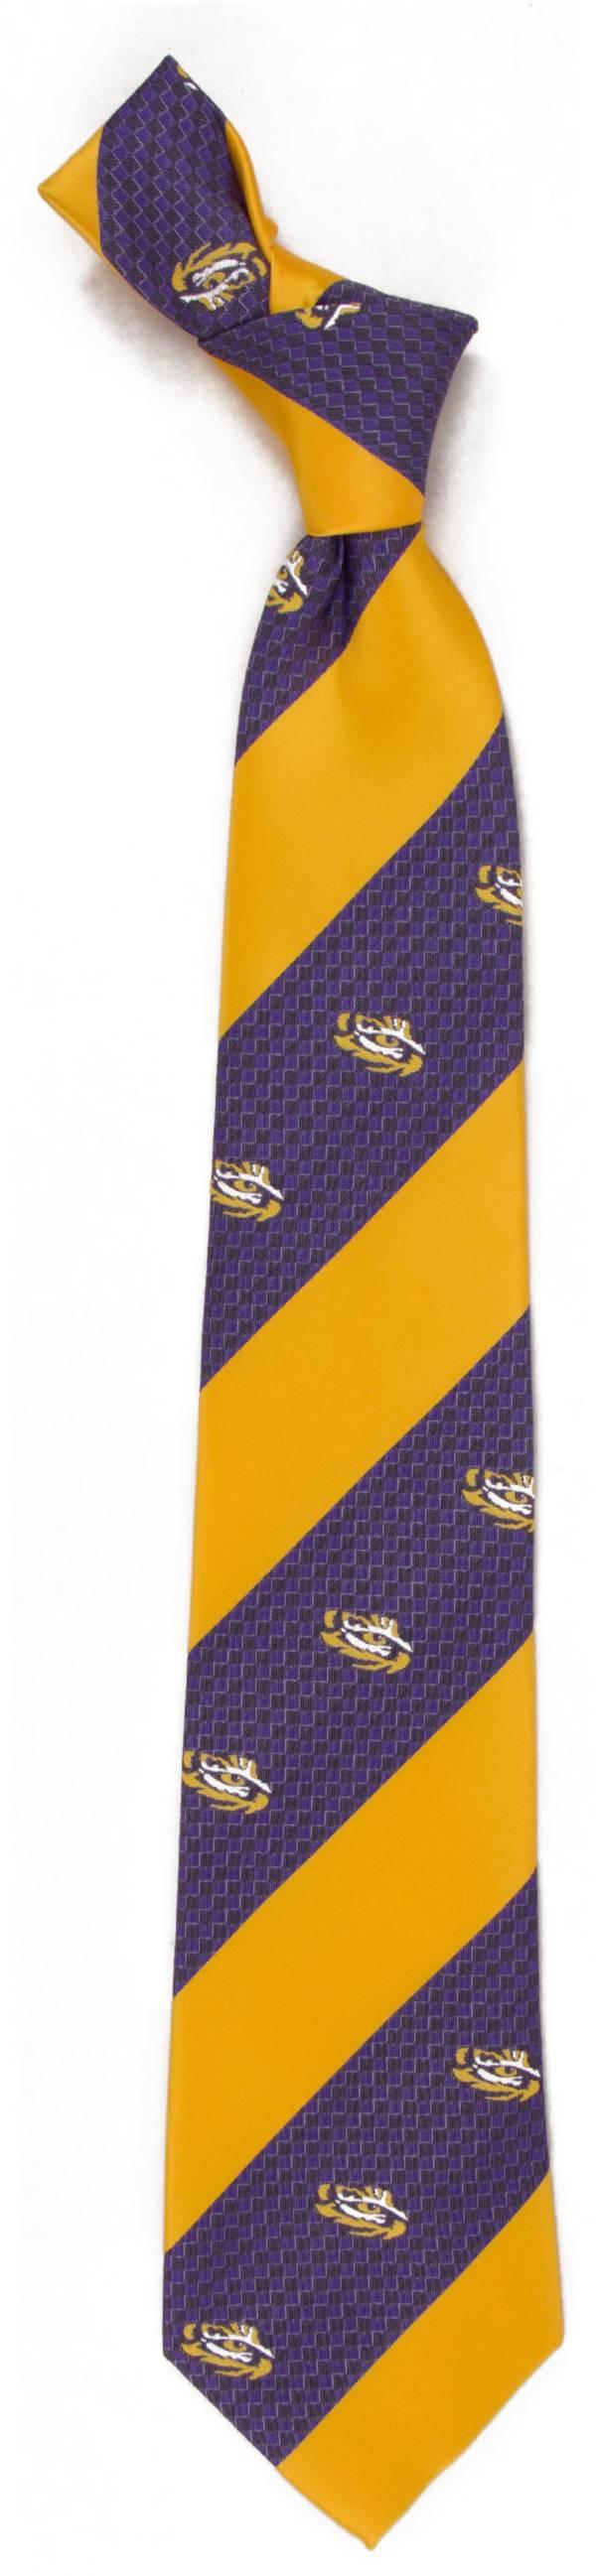 Eagles Wings LSU Tigers Geo Stripe Necktie product image